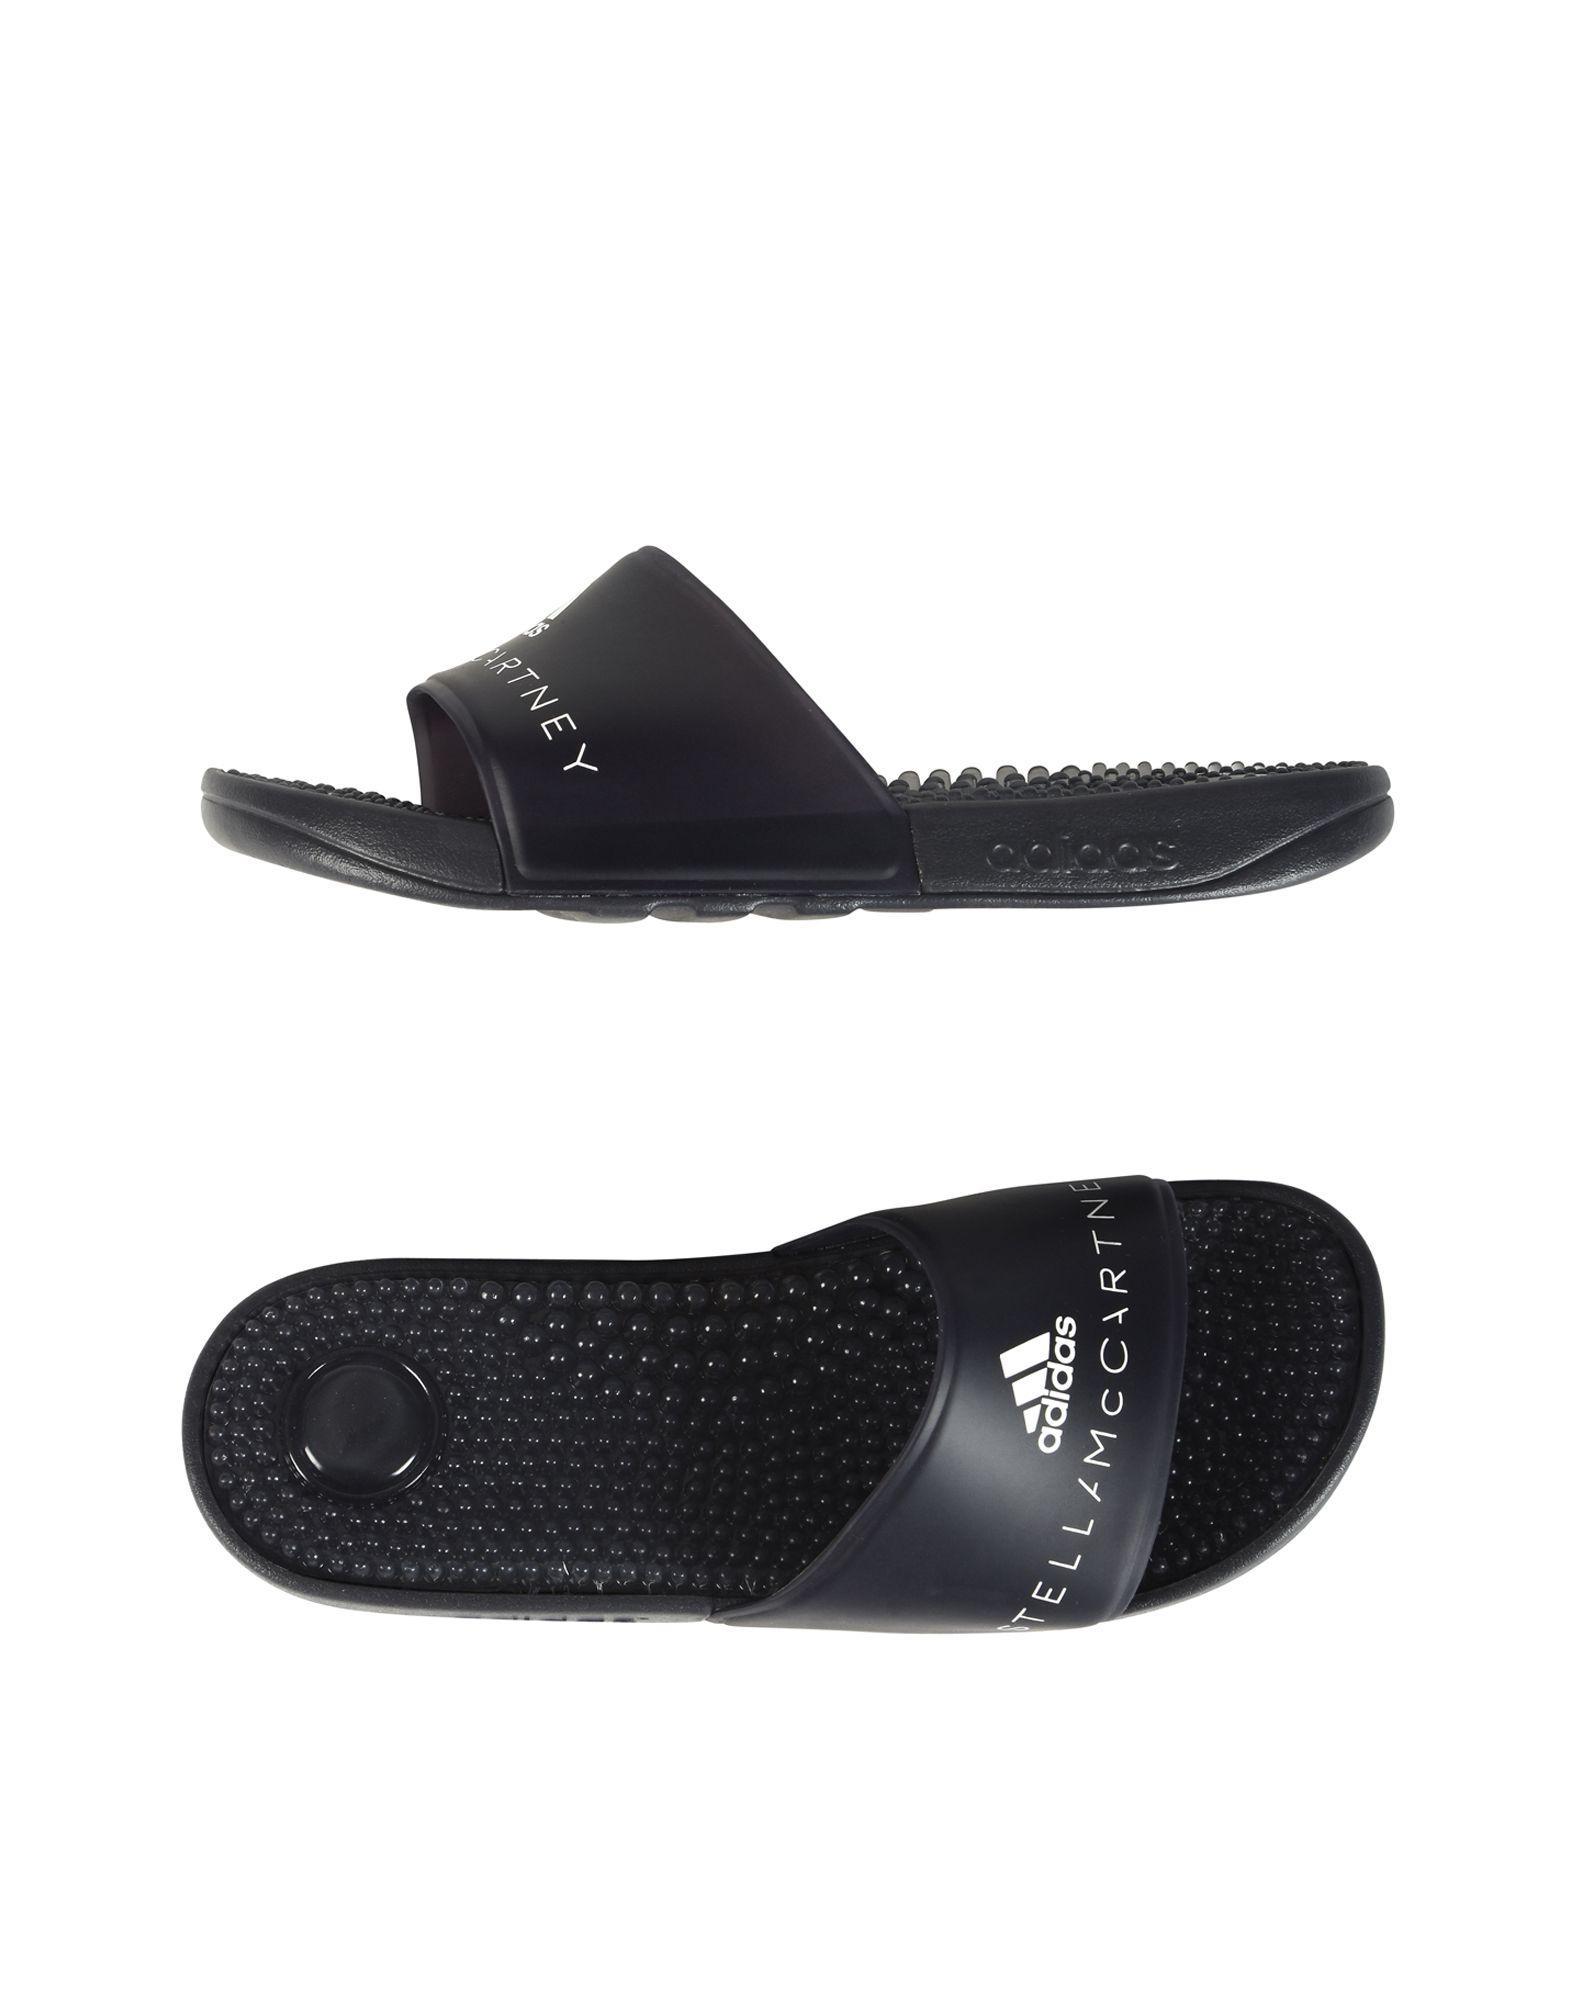 dec08465a Adidas By Stella Mccartney Adissage Slide Sandal With Massaging Footbed In  Grey